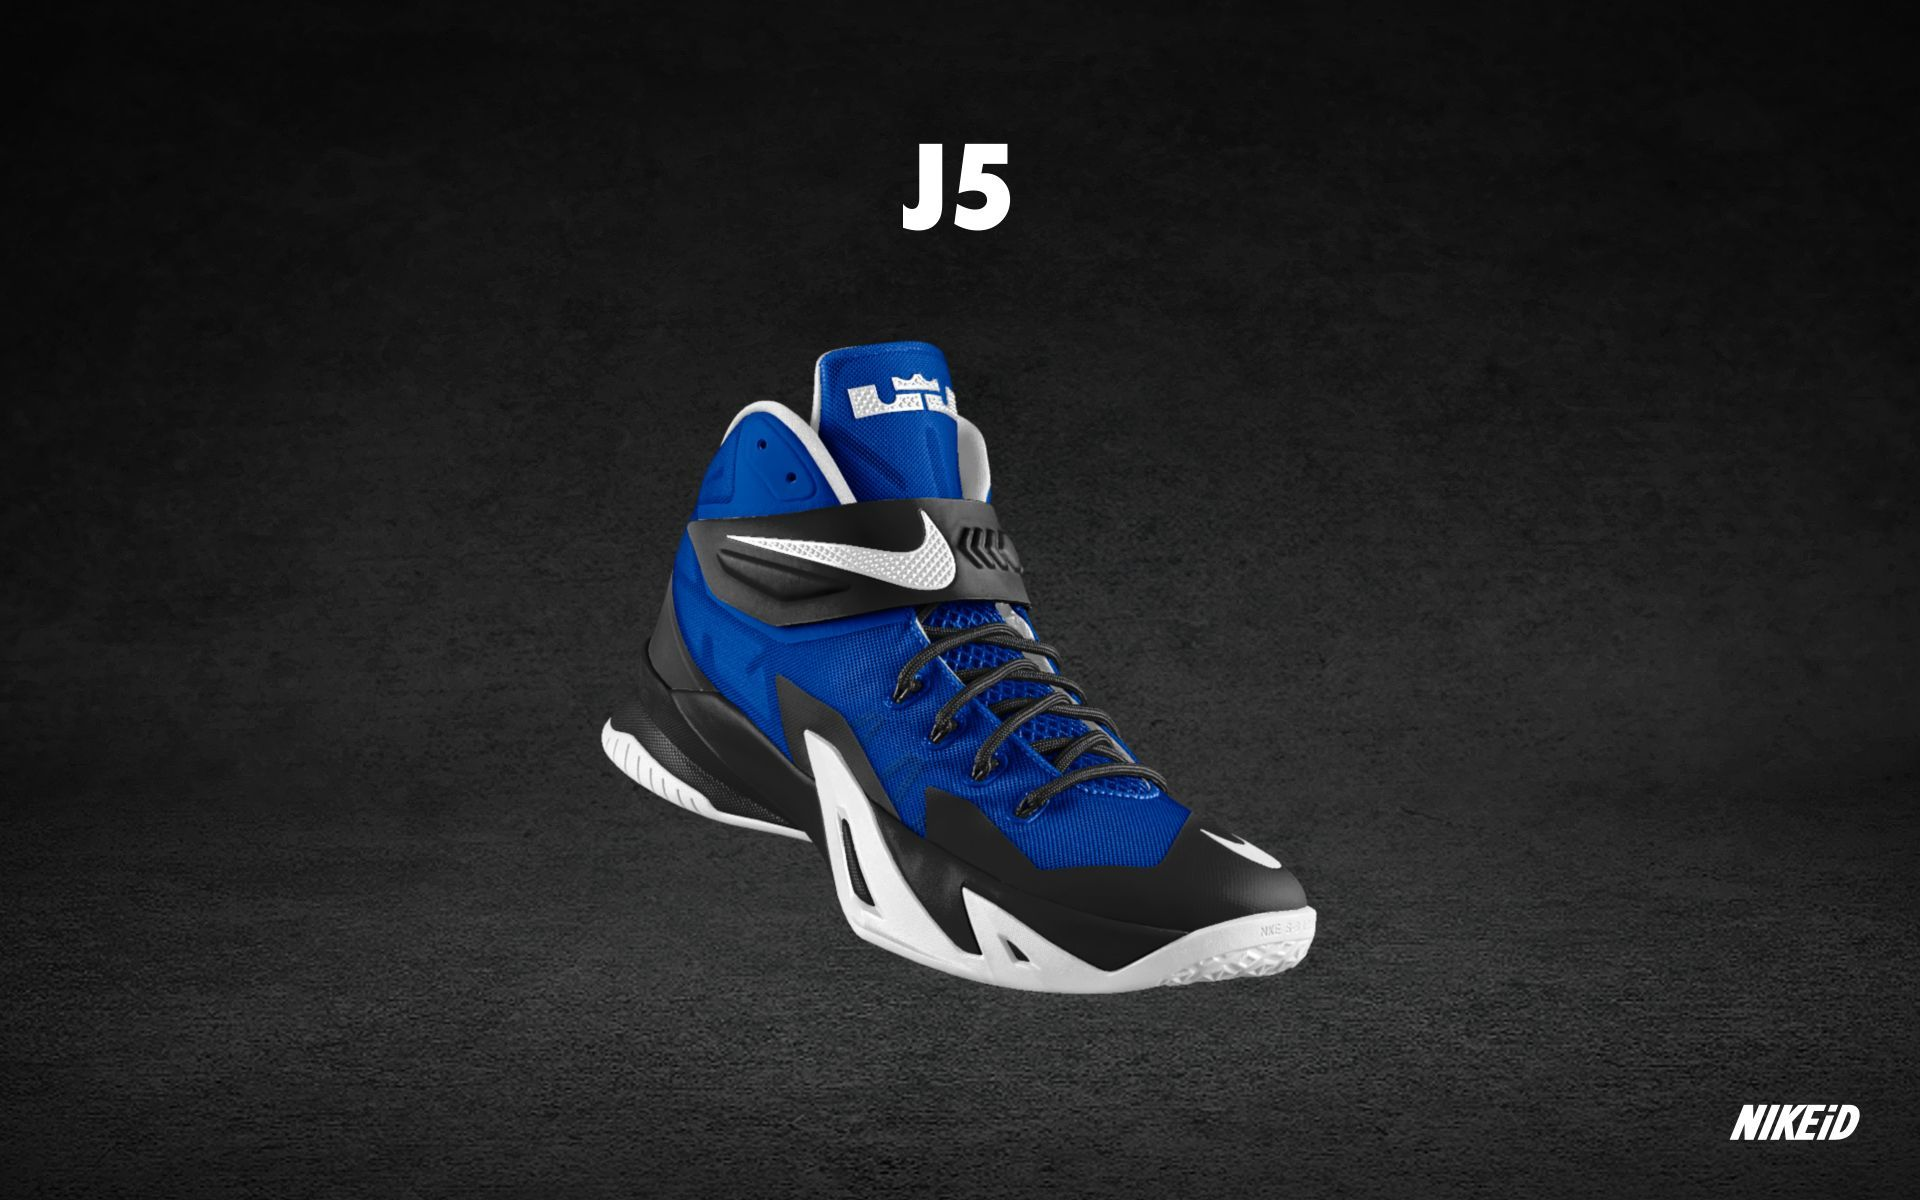 Pin by Jon Nickell on Wish List Nike id, Sneakers, Fashion